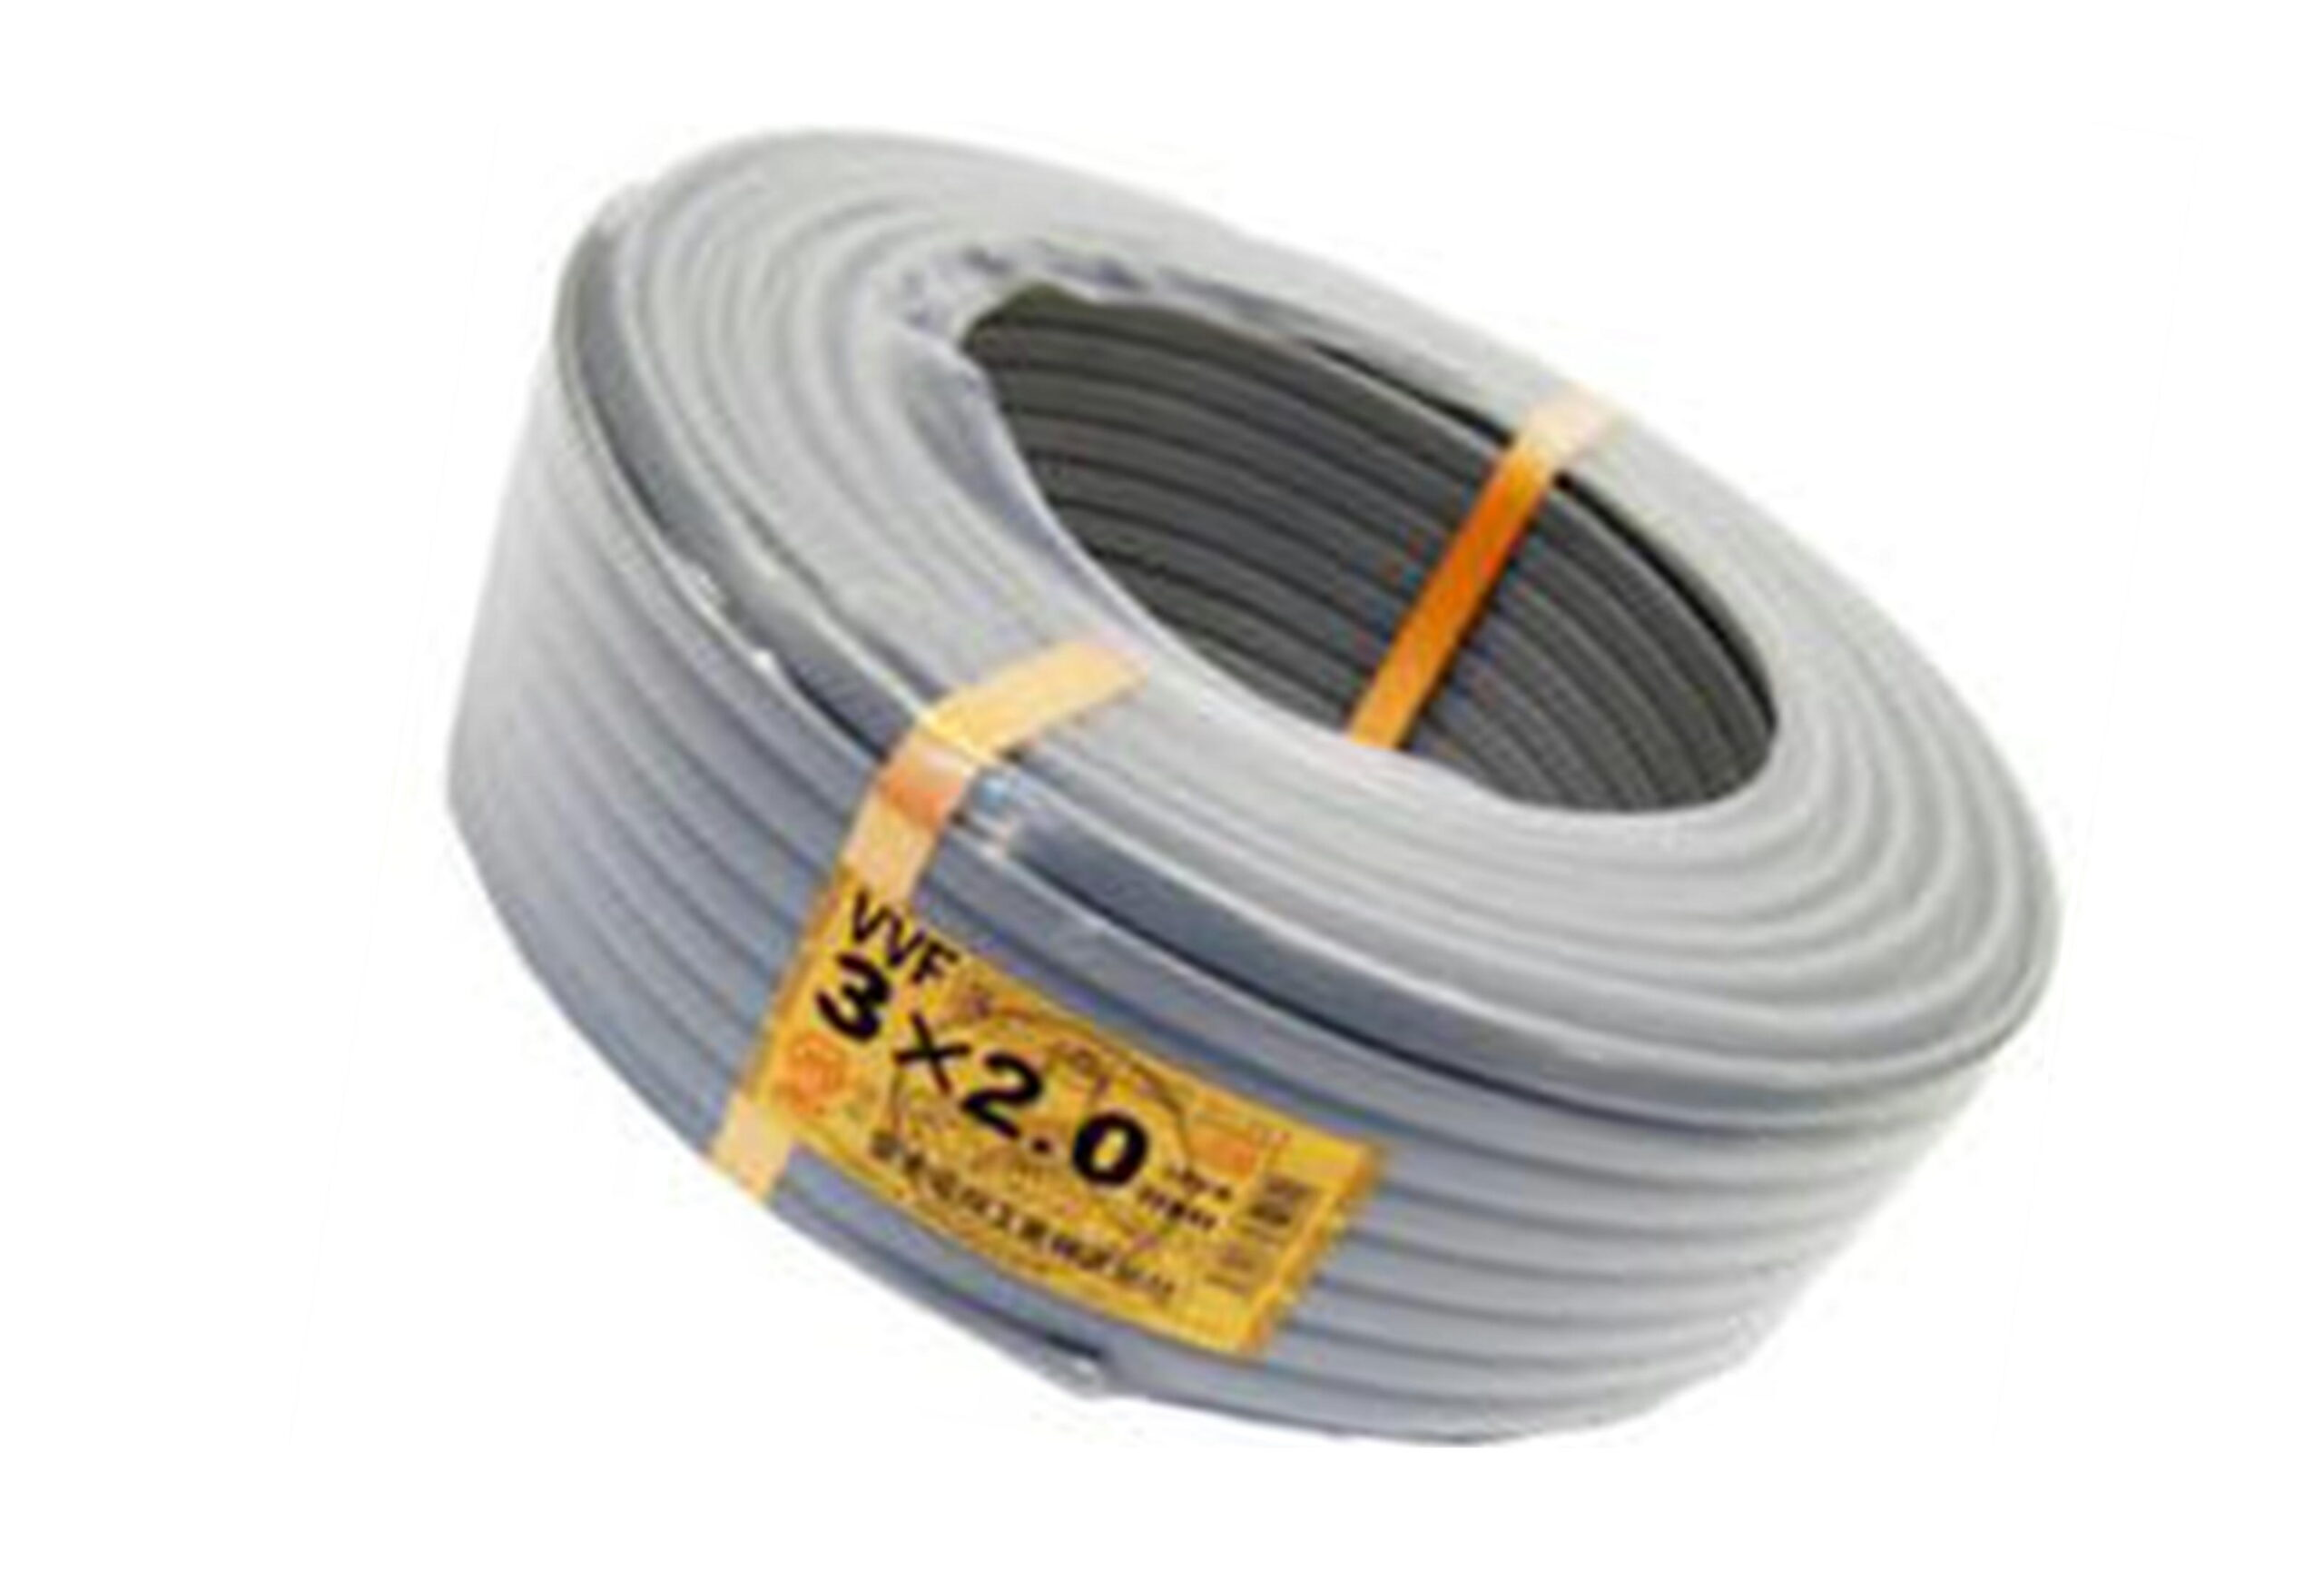 VVFケーブル 3x2.0mm    ネット限定買取価格       地域最高価格で買取ます